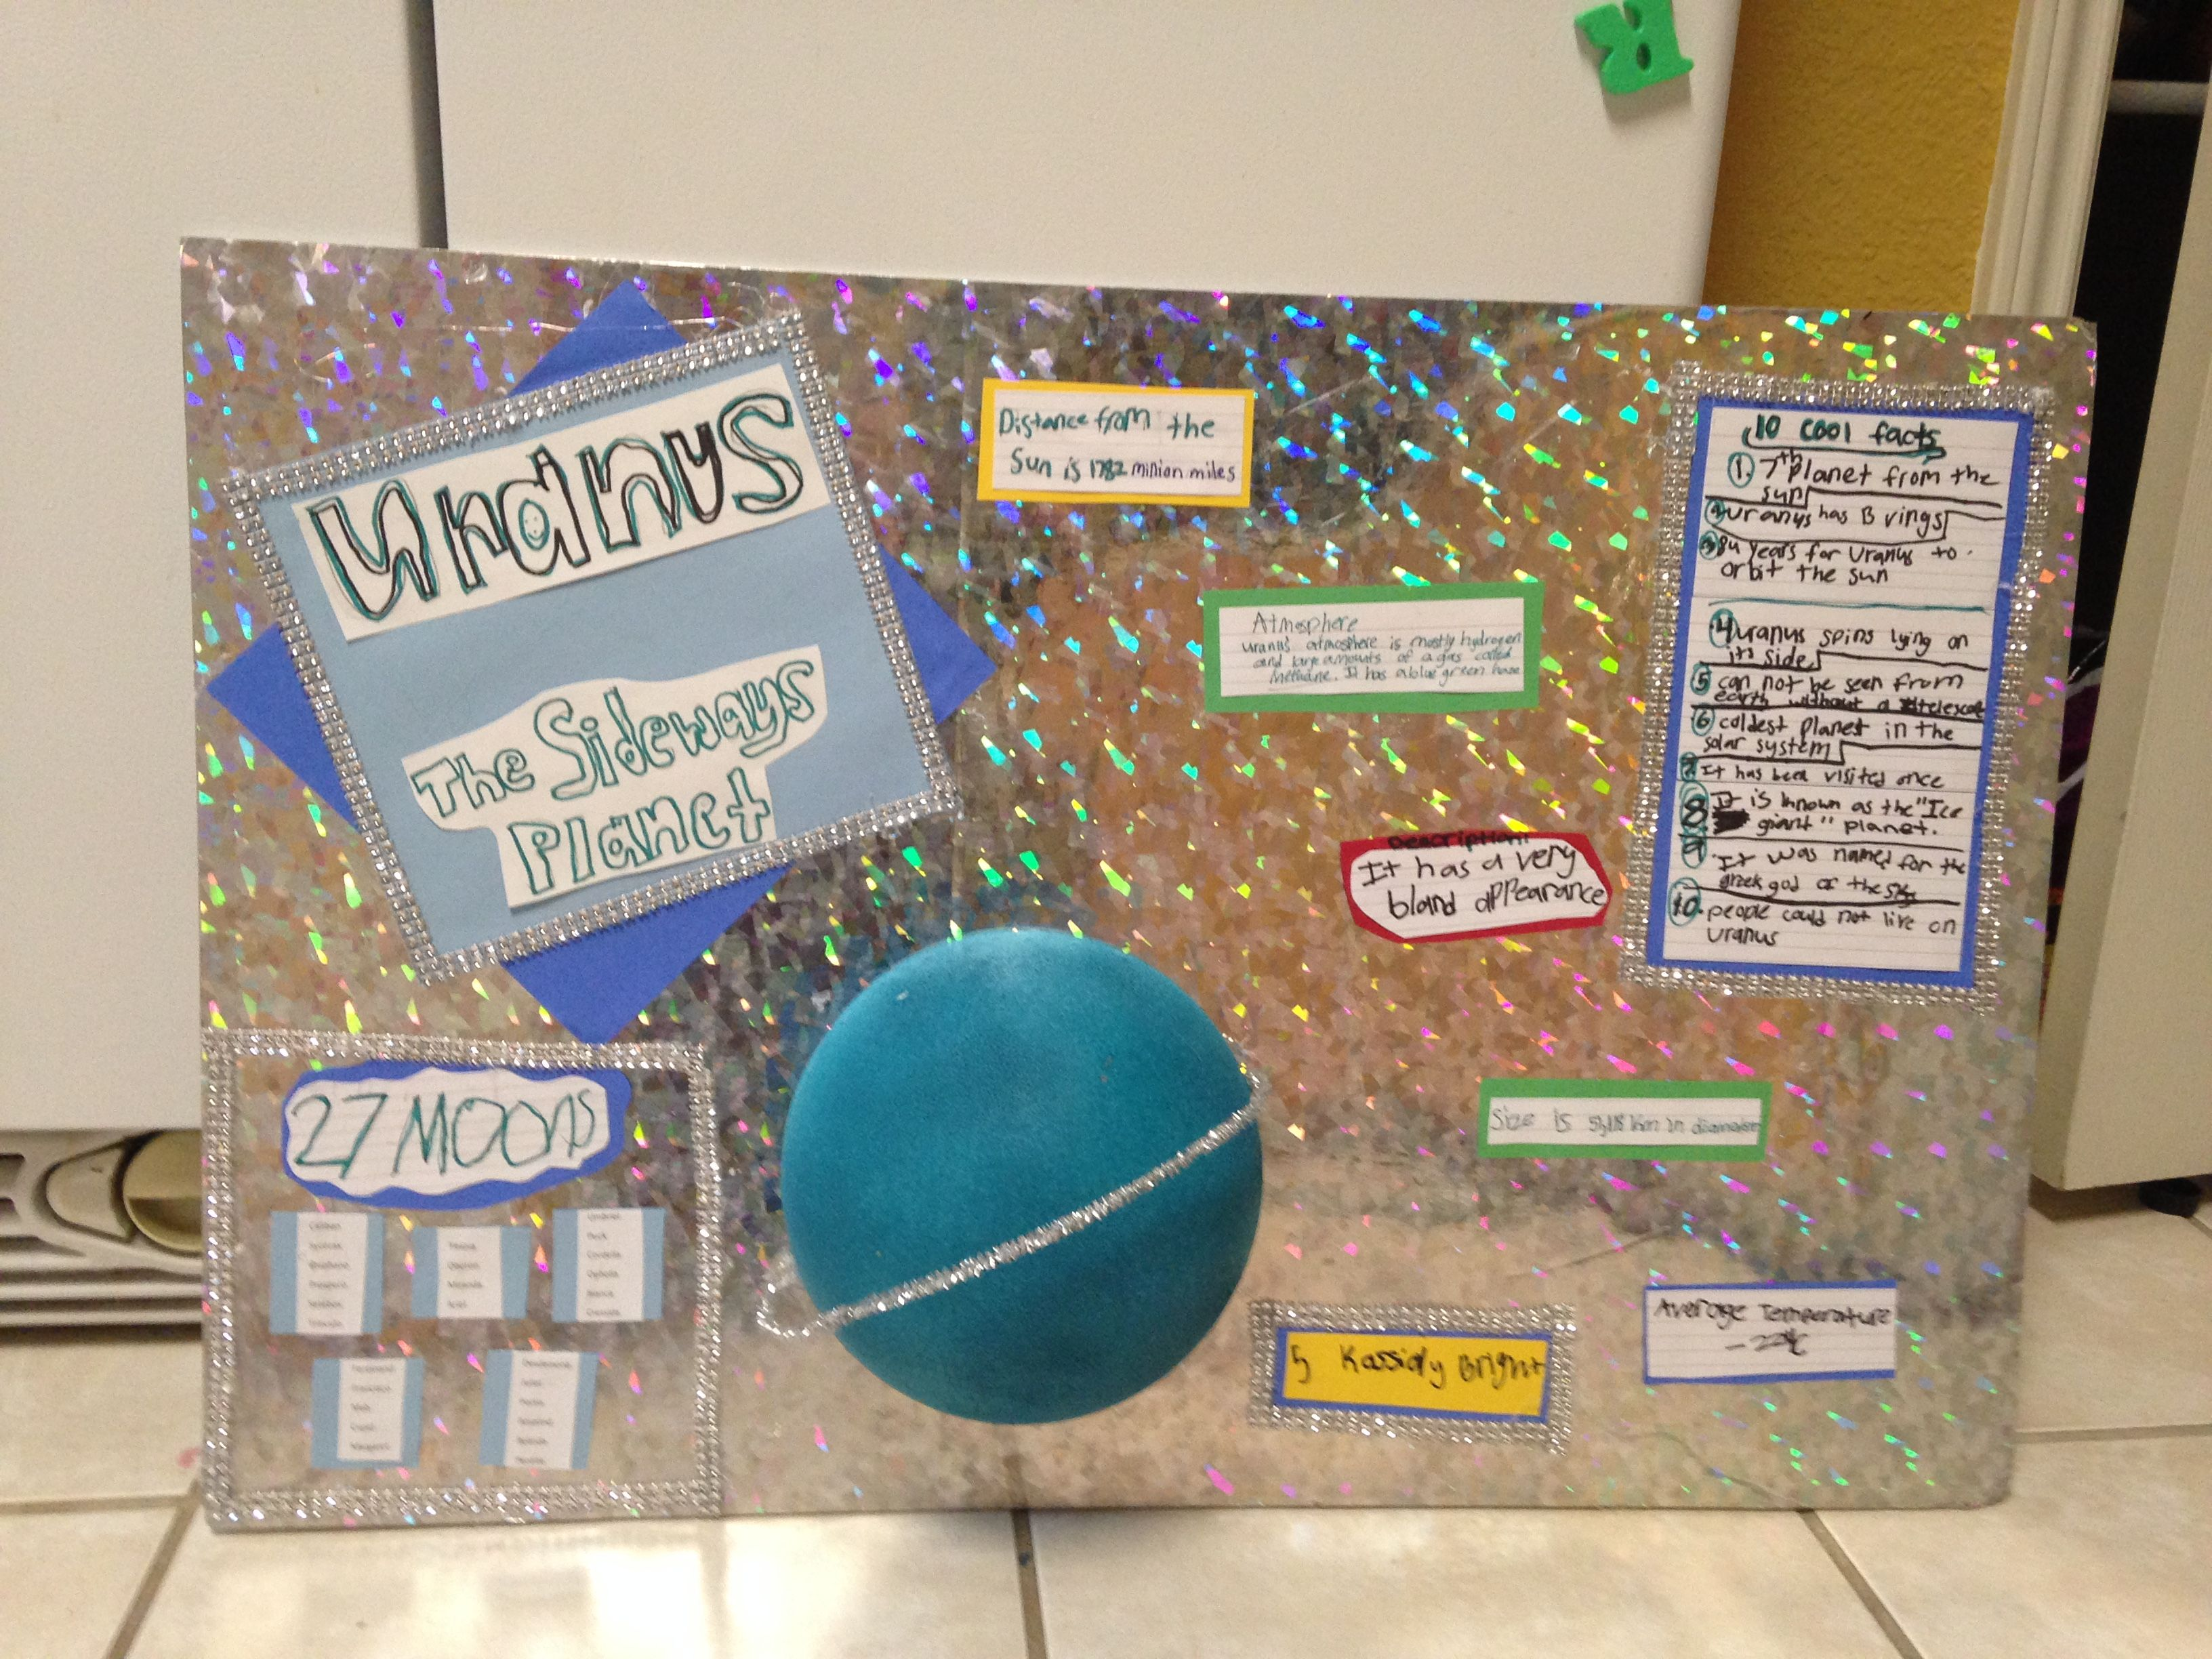 Projects On Uranius